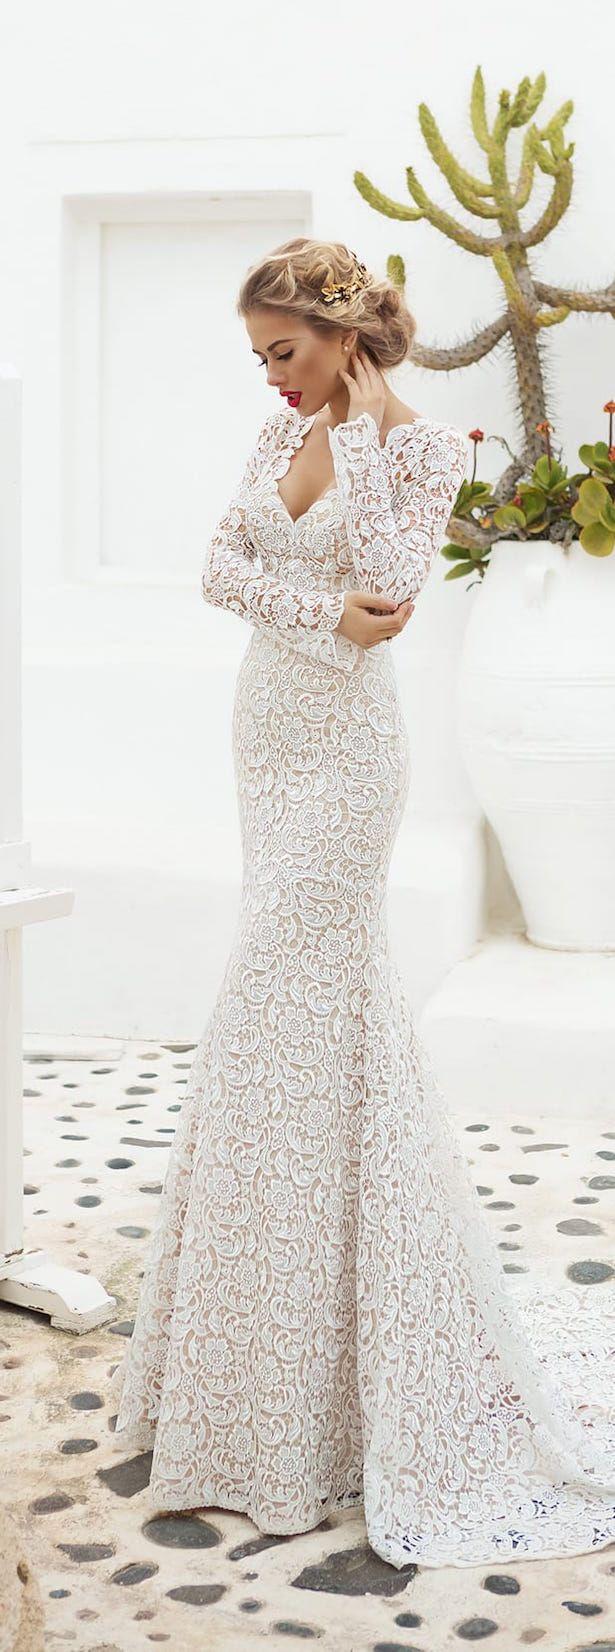 Lanesta Bridal -Story of the Rose Collection   Hochzeitskleider ...